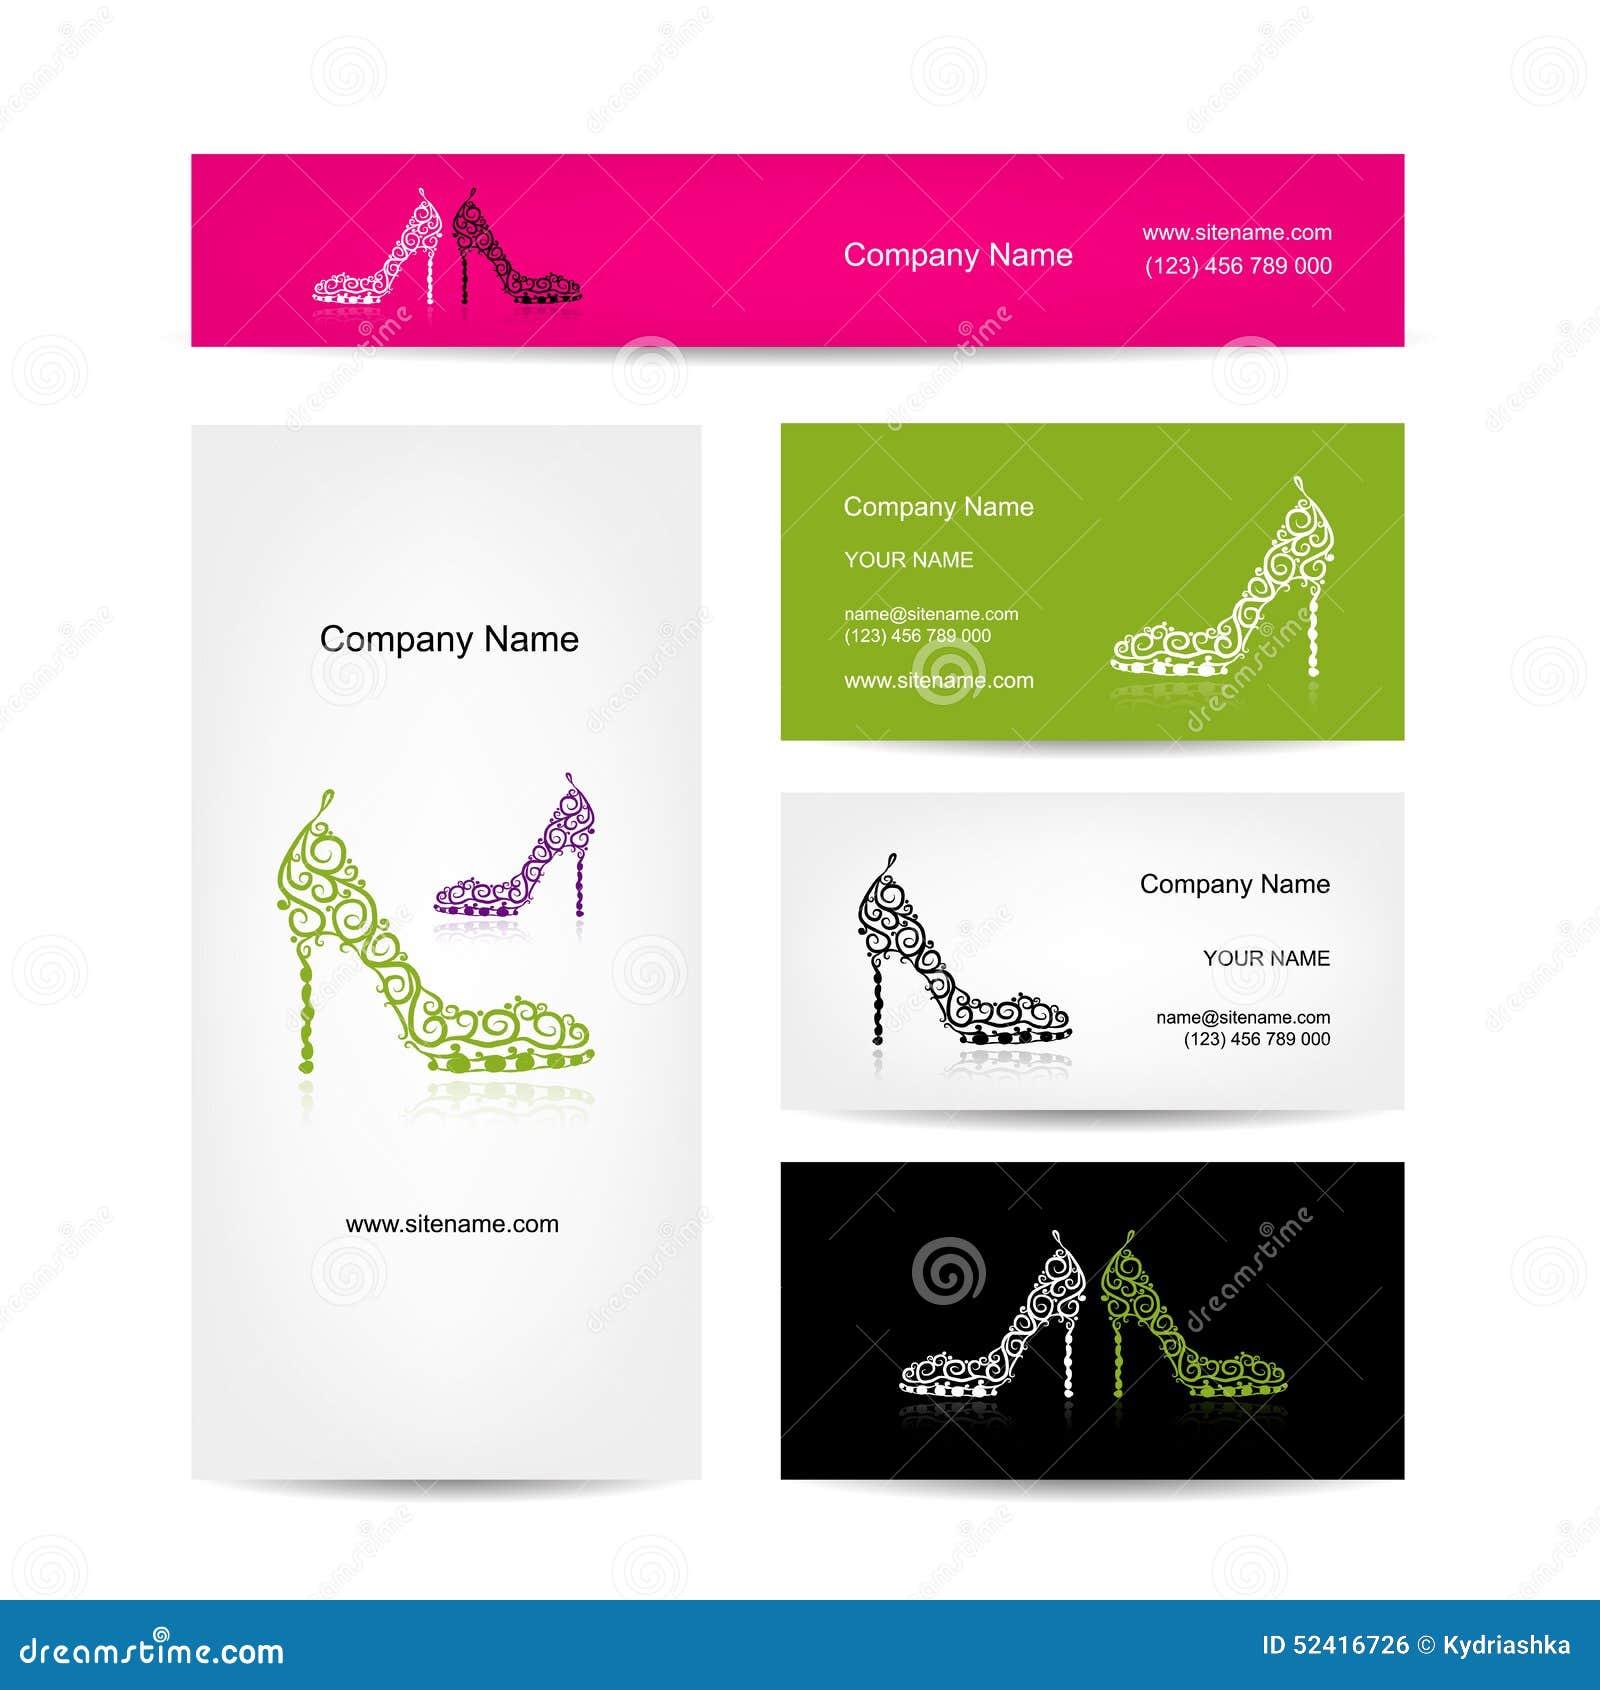 Business cards design ornate female shoes stock vector download business cards design ornate female shoes stock vector illustration of heel cover colourmoves